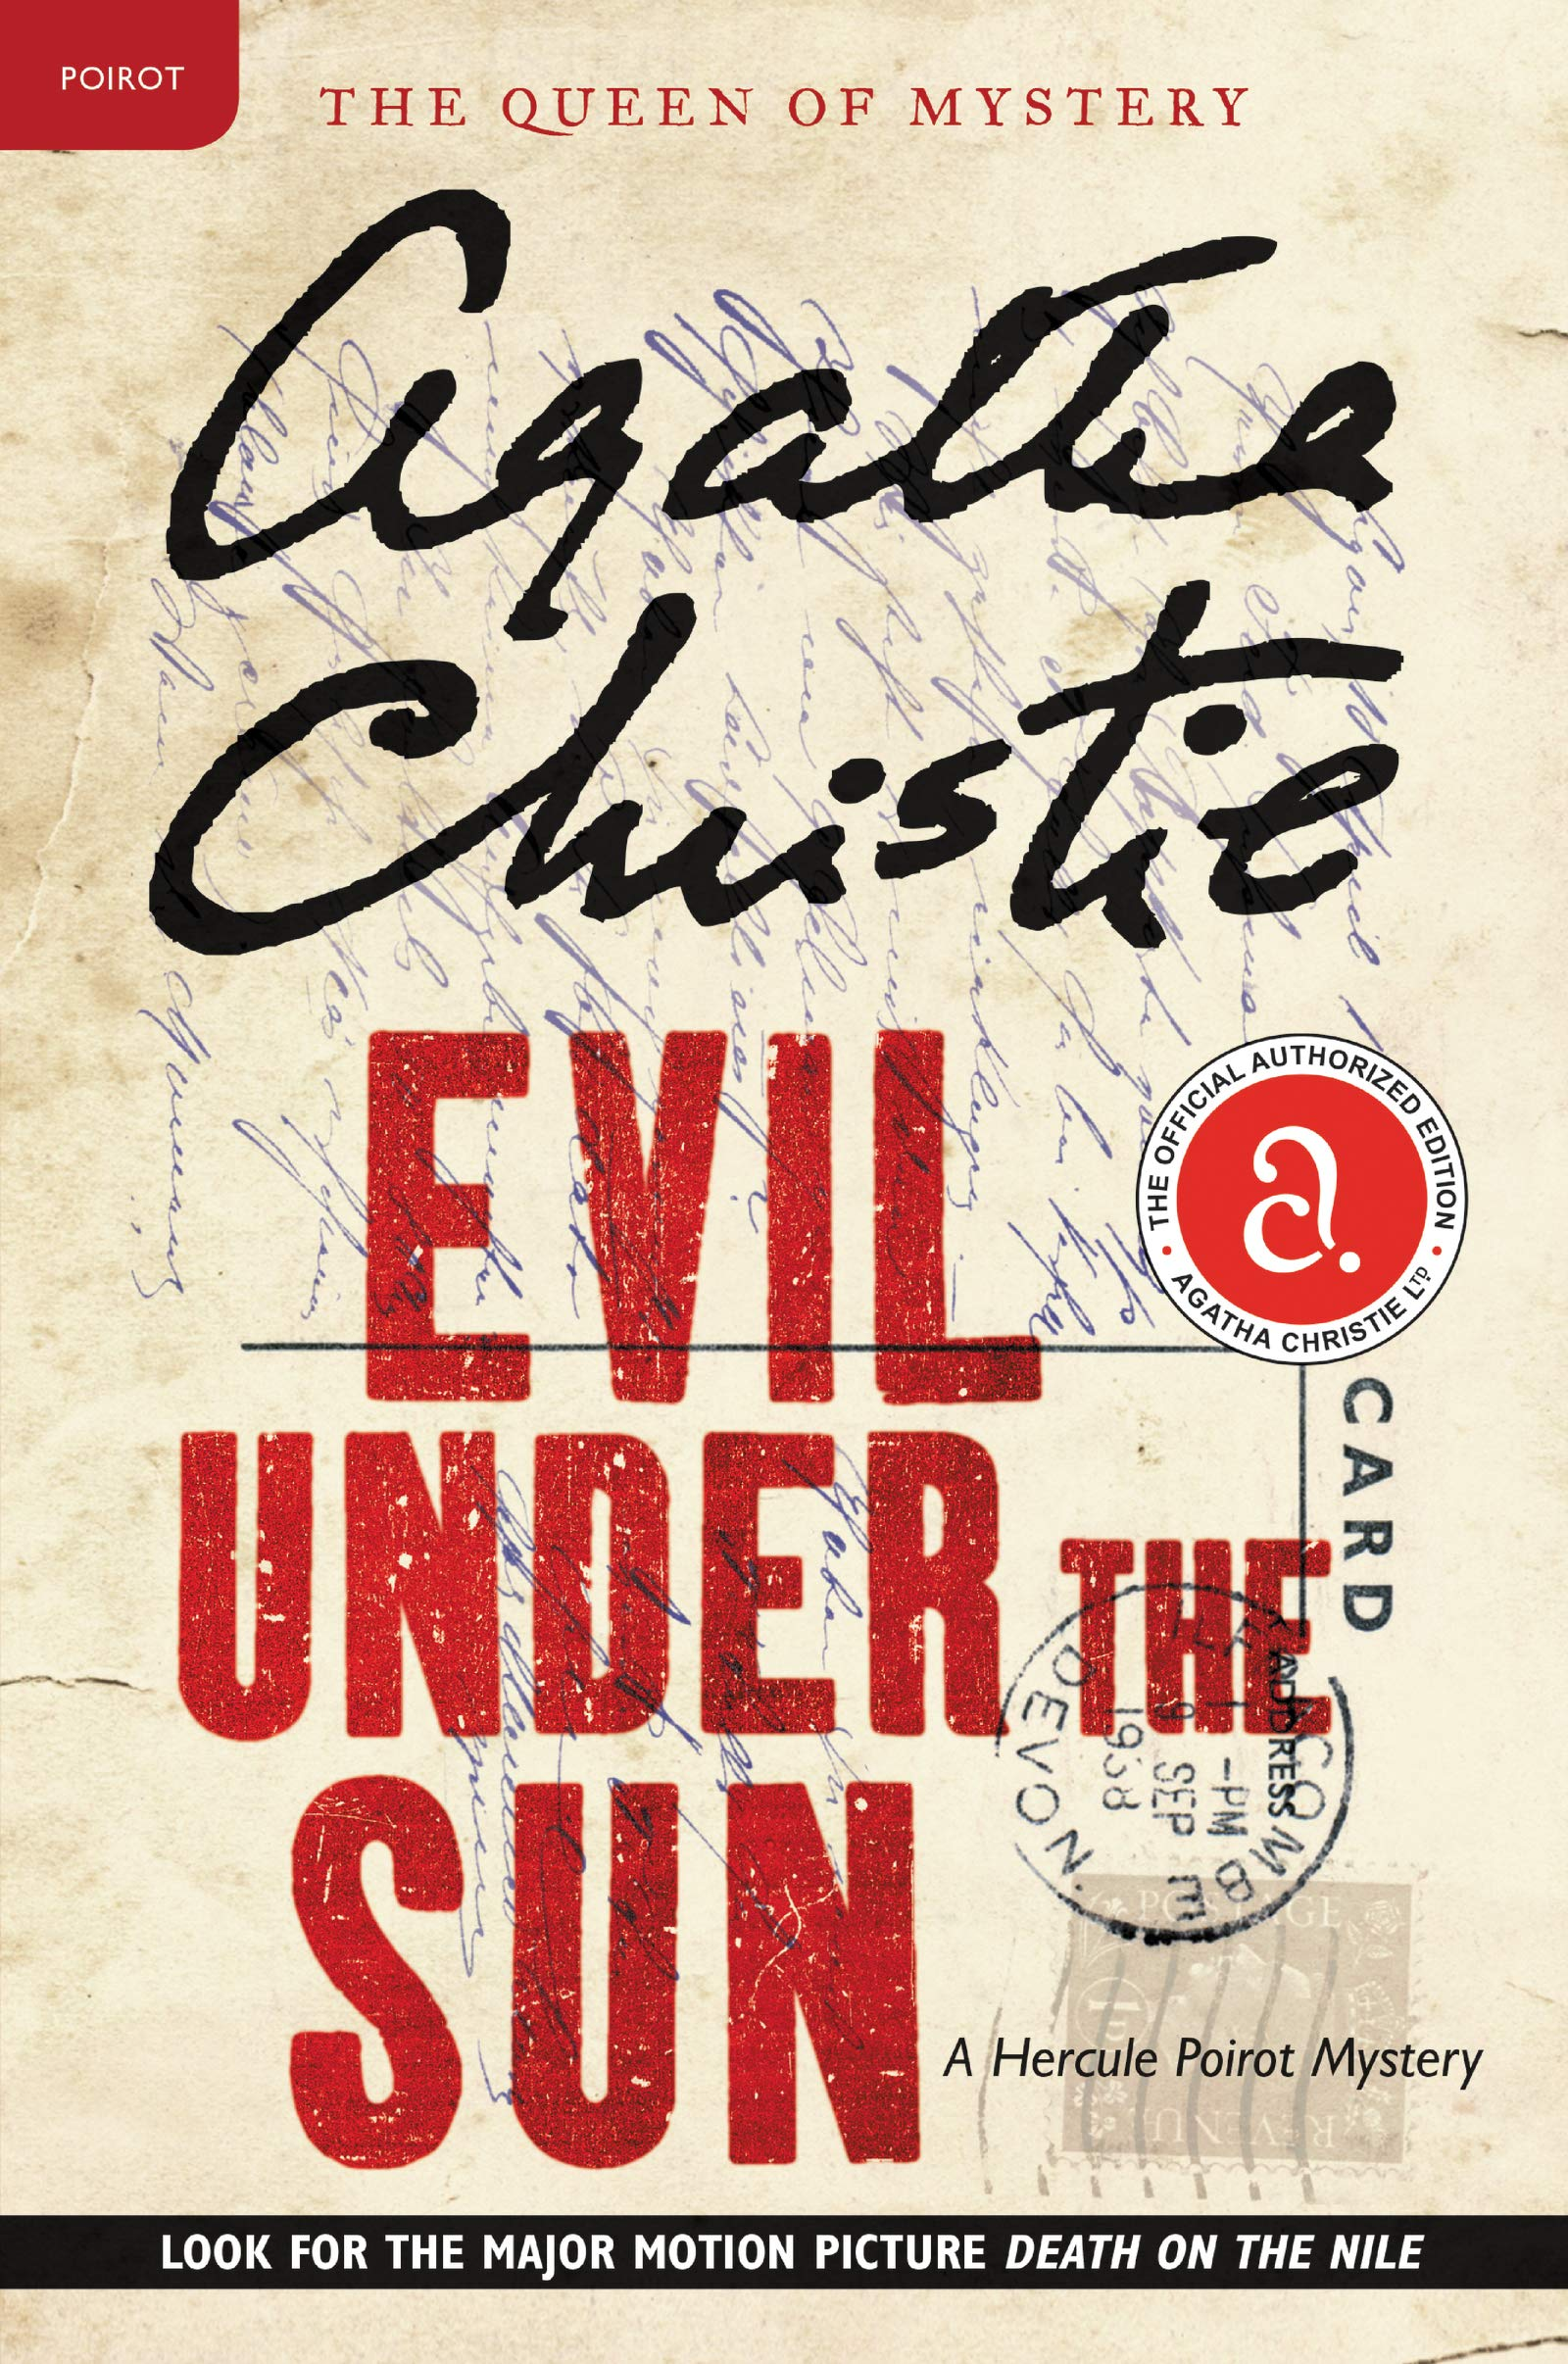 Amazon.com: Evil Under the Sun: A Hercule Poirot Mystery (Hercule Poirot  Mysteries, 23) (9780062073938): Christie, Agatha: Books